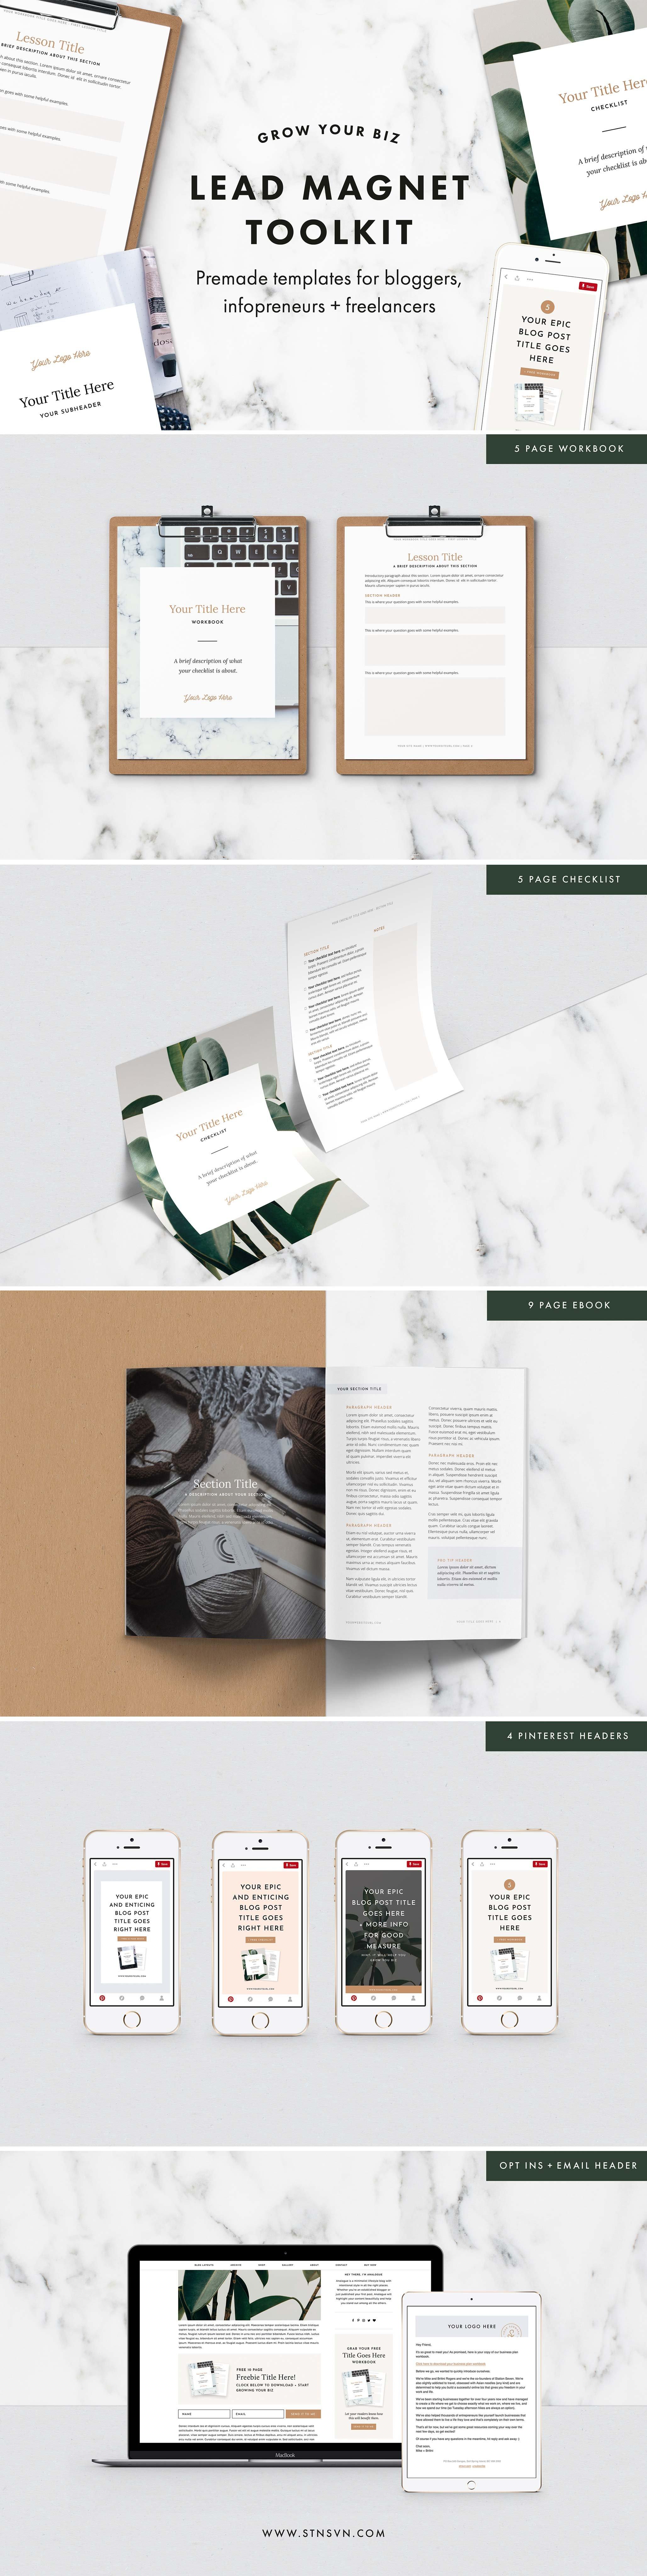 lead magnet toolkit bundle email templates creative market. Black Bedroom Furniture Sets. Home Design Ideas